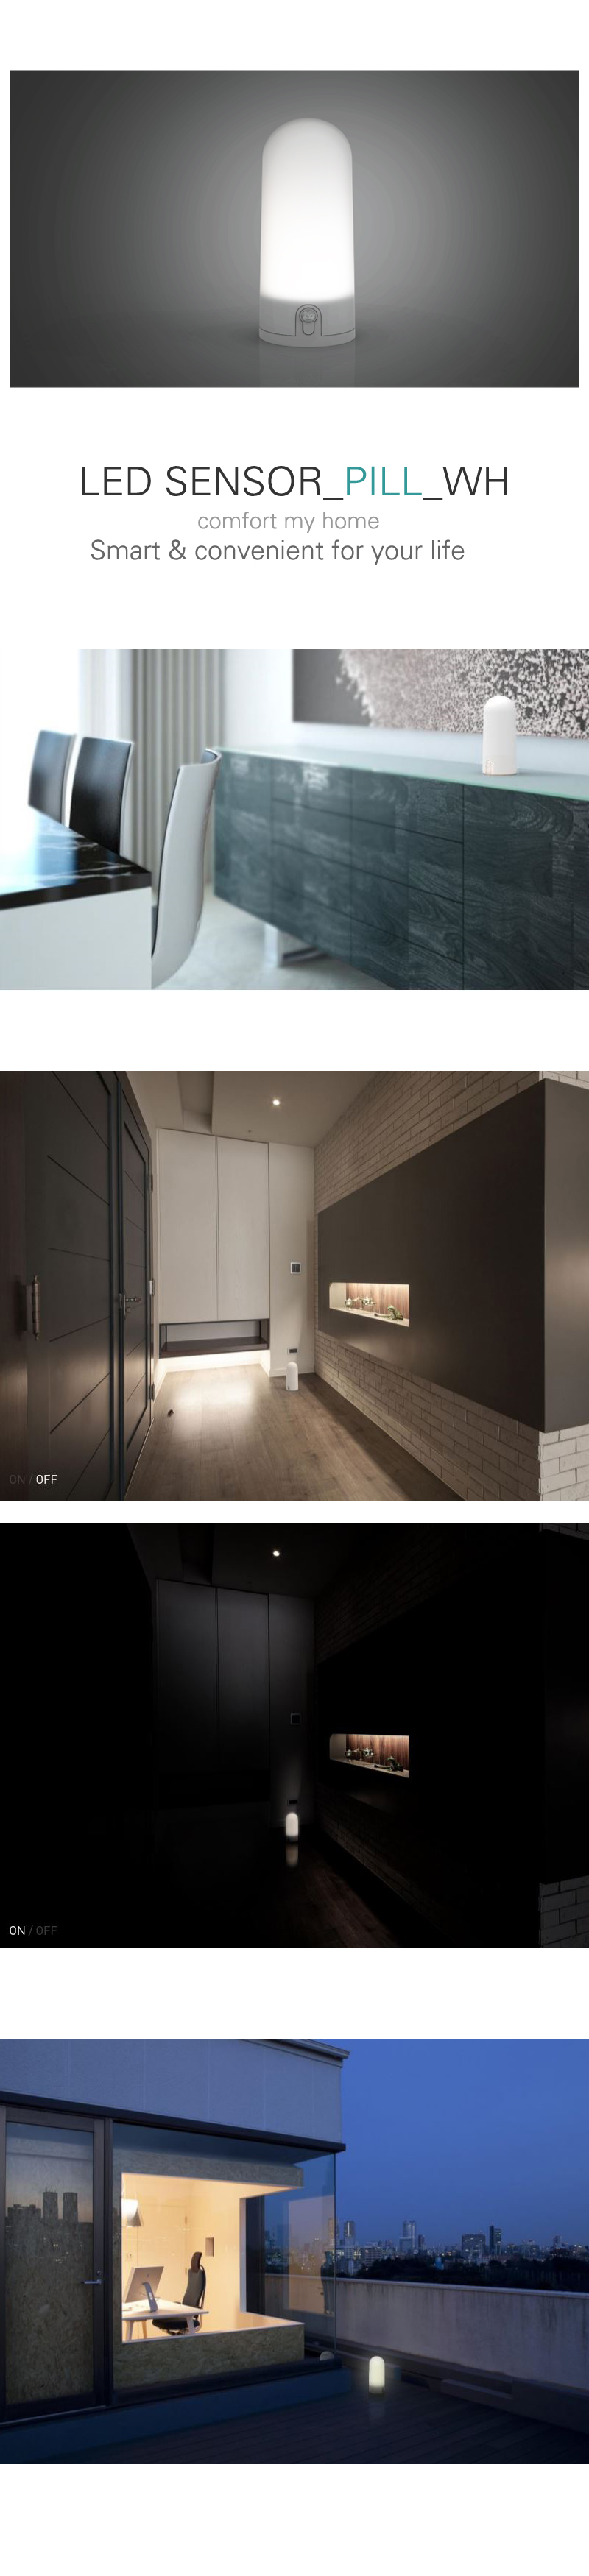 LED SENSOR PILL - 오-하, 13,300원, 리빙조명, 테이블조명